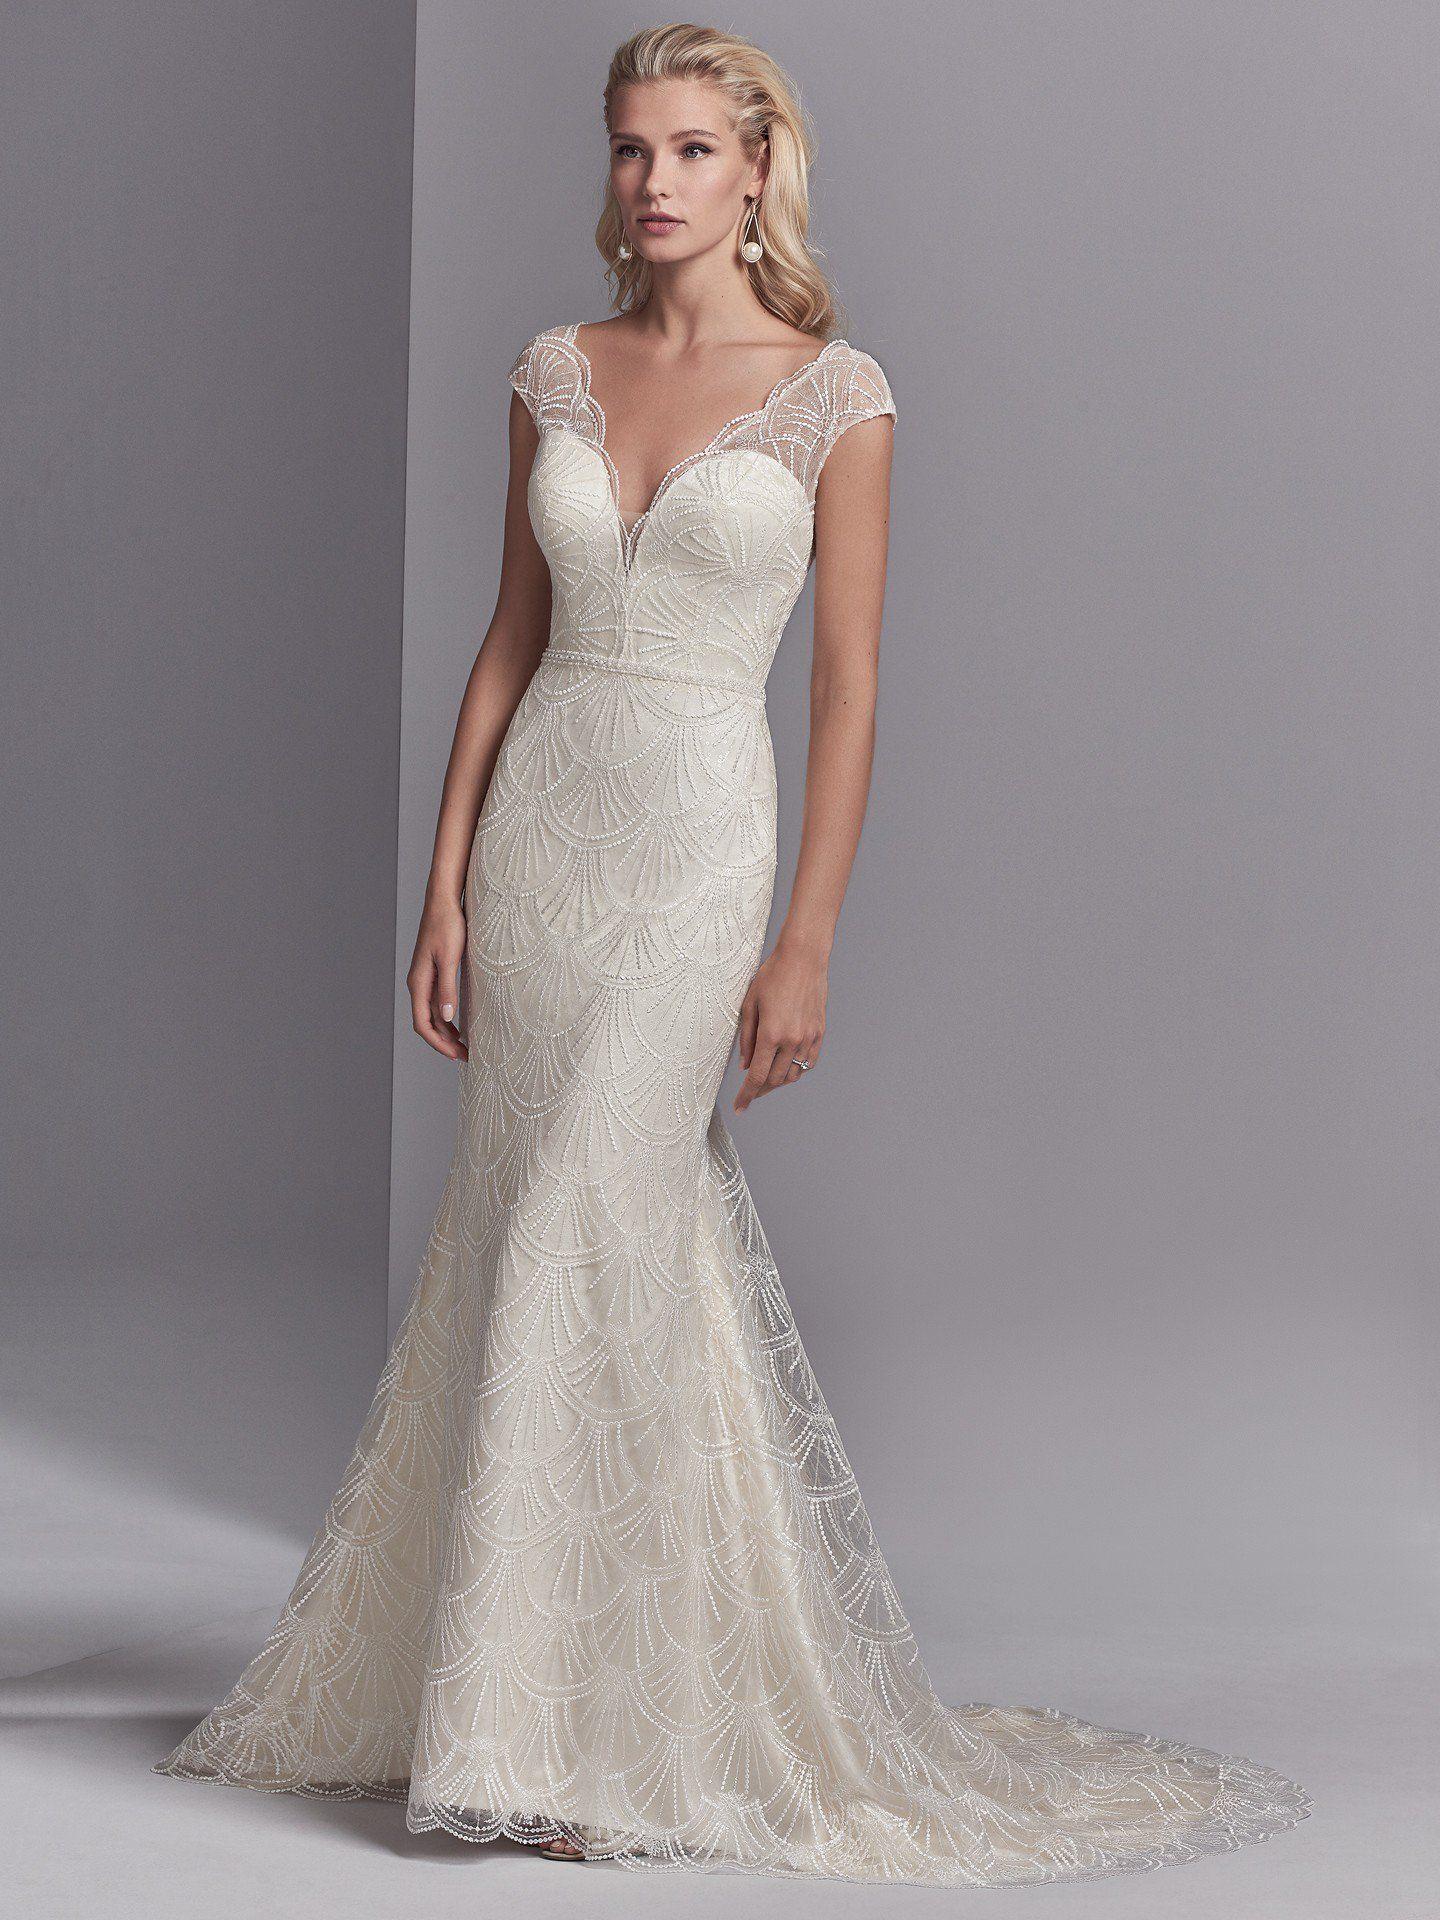 Pearl belt for wedding dress  Maggie Sottero Wedding Dresses  Wedding dress Gowns and Wedding